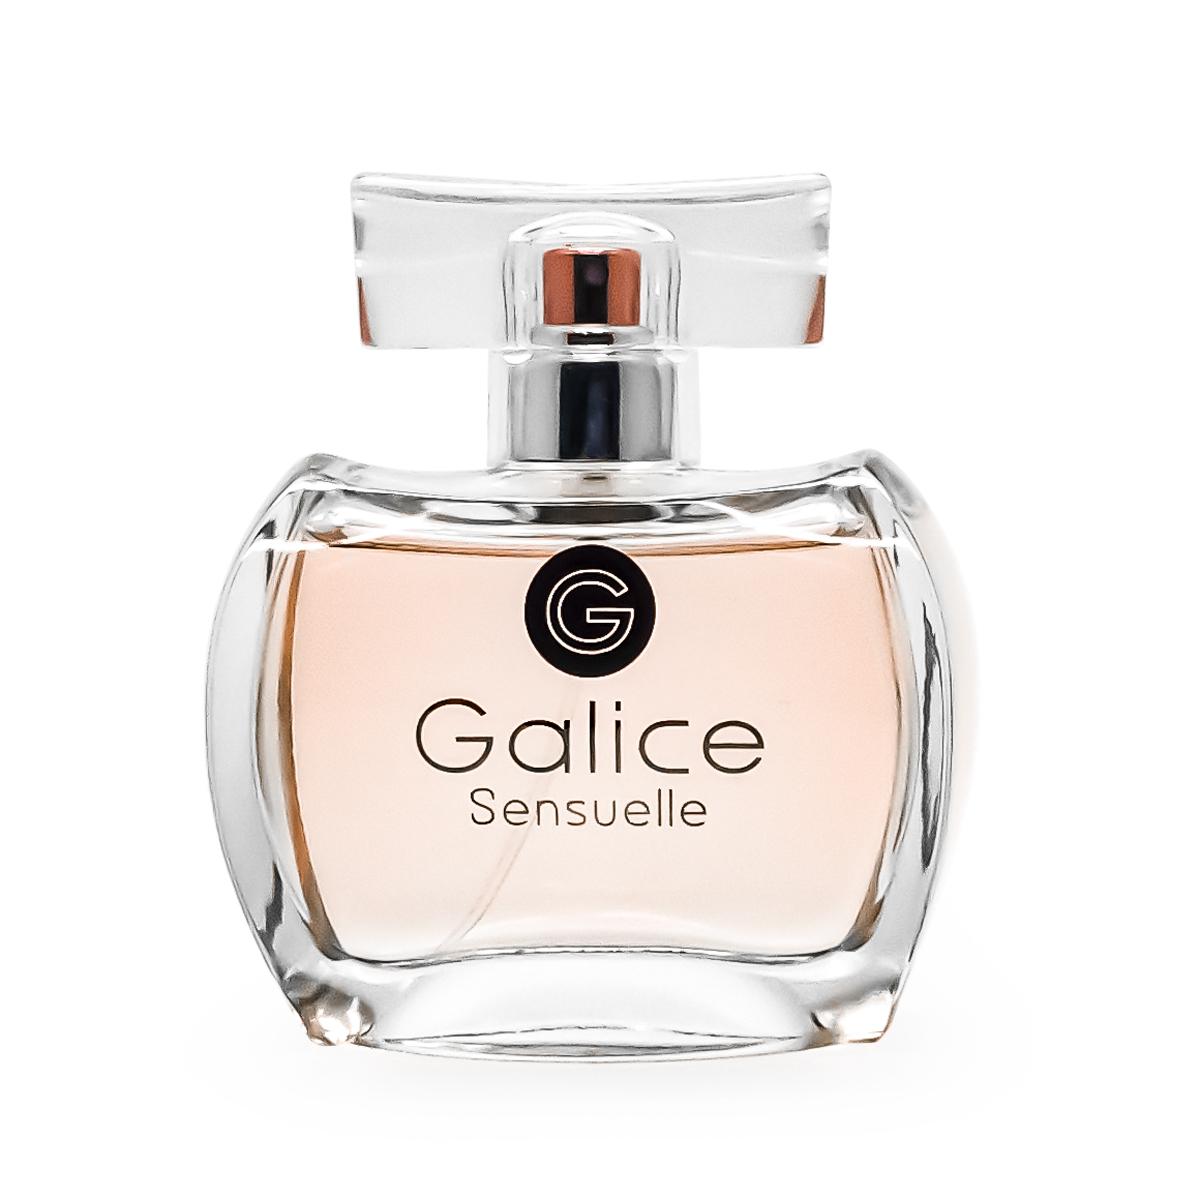 Perfume Galice Sensuelle Feminino Edp 100ml Paris Bleu